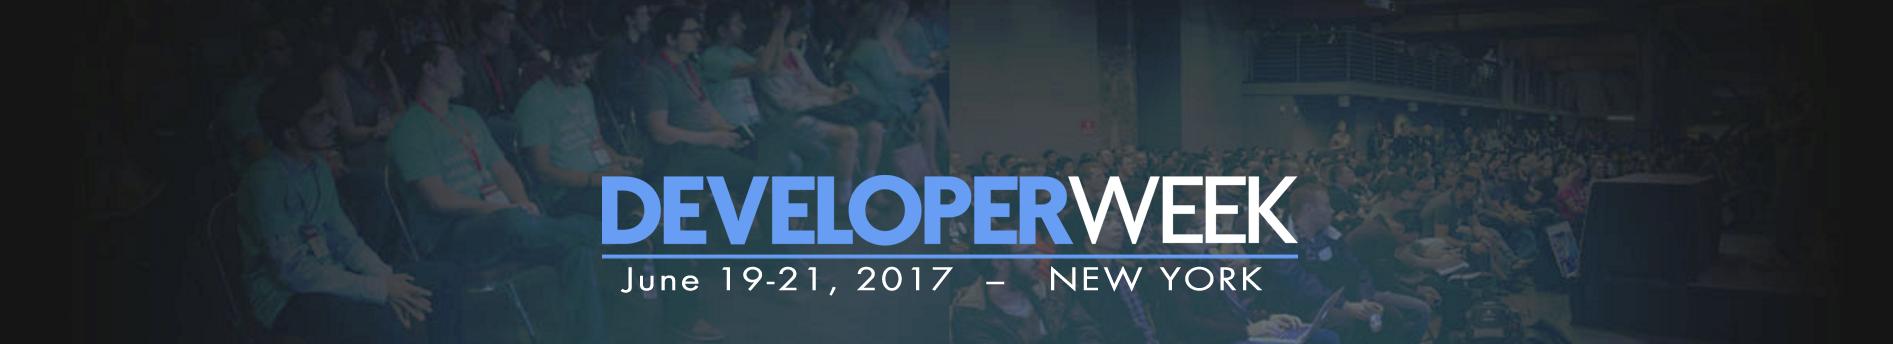 developer-week-2017-banner